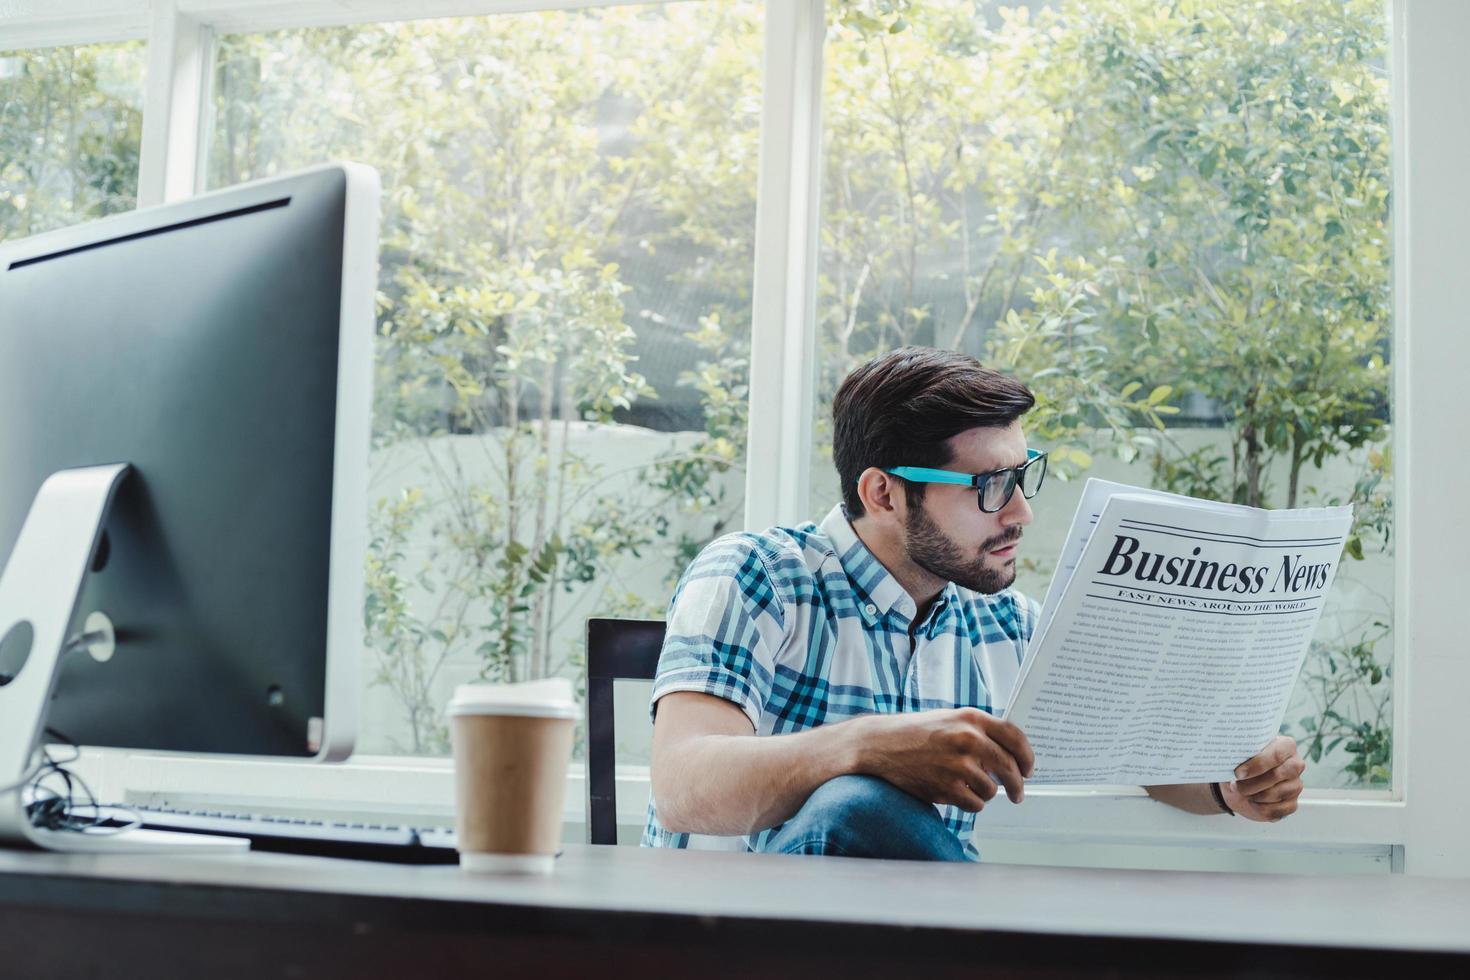 Caucasian man reading business news photo